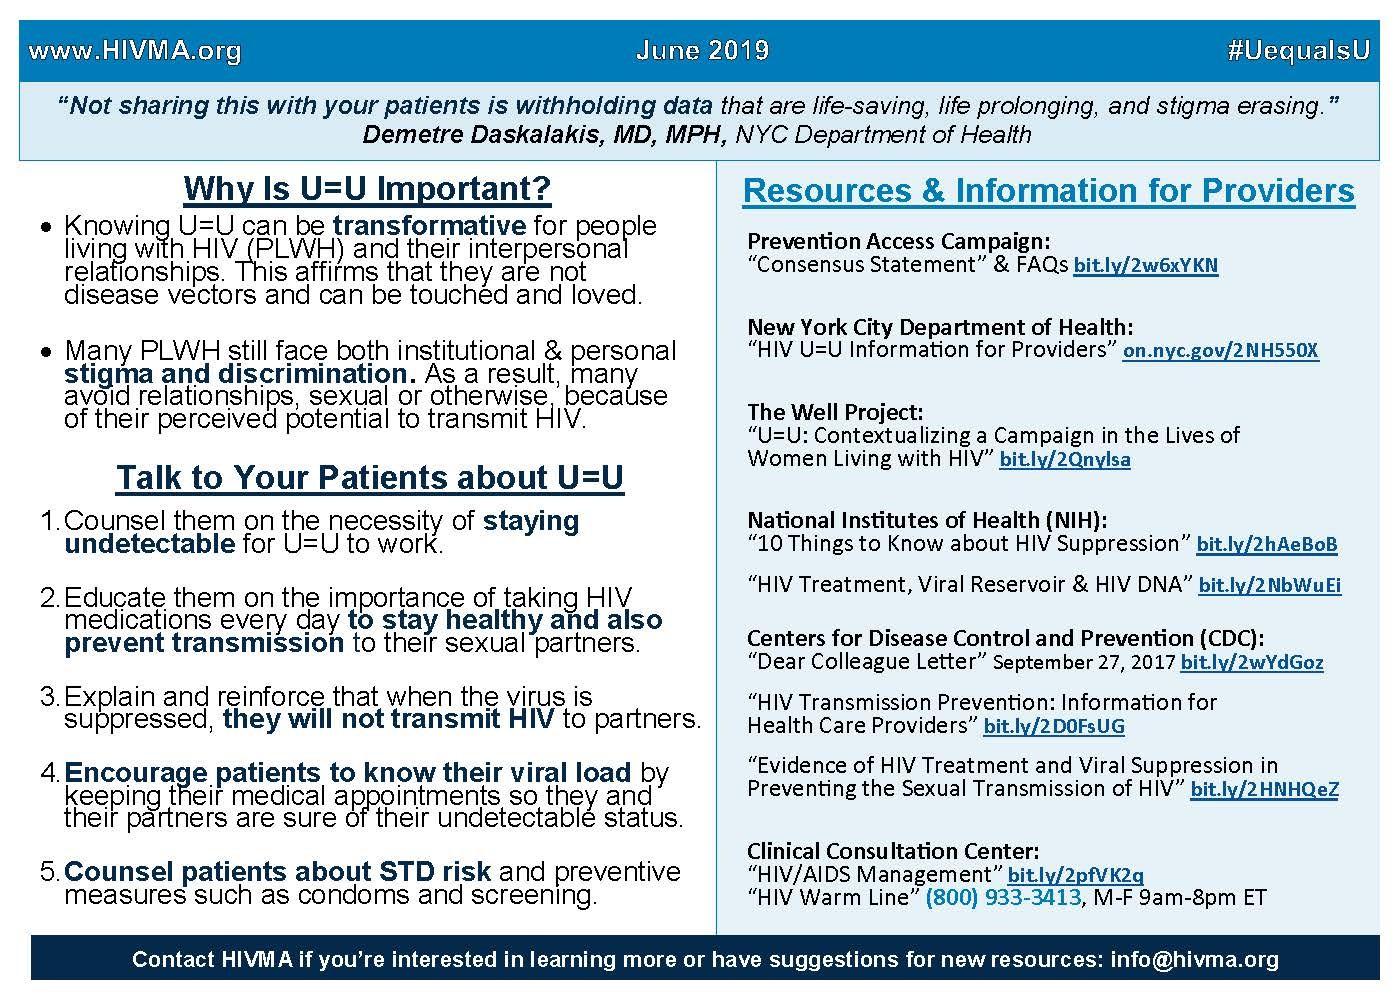 HIV Treatment as Preventions U=U